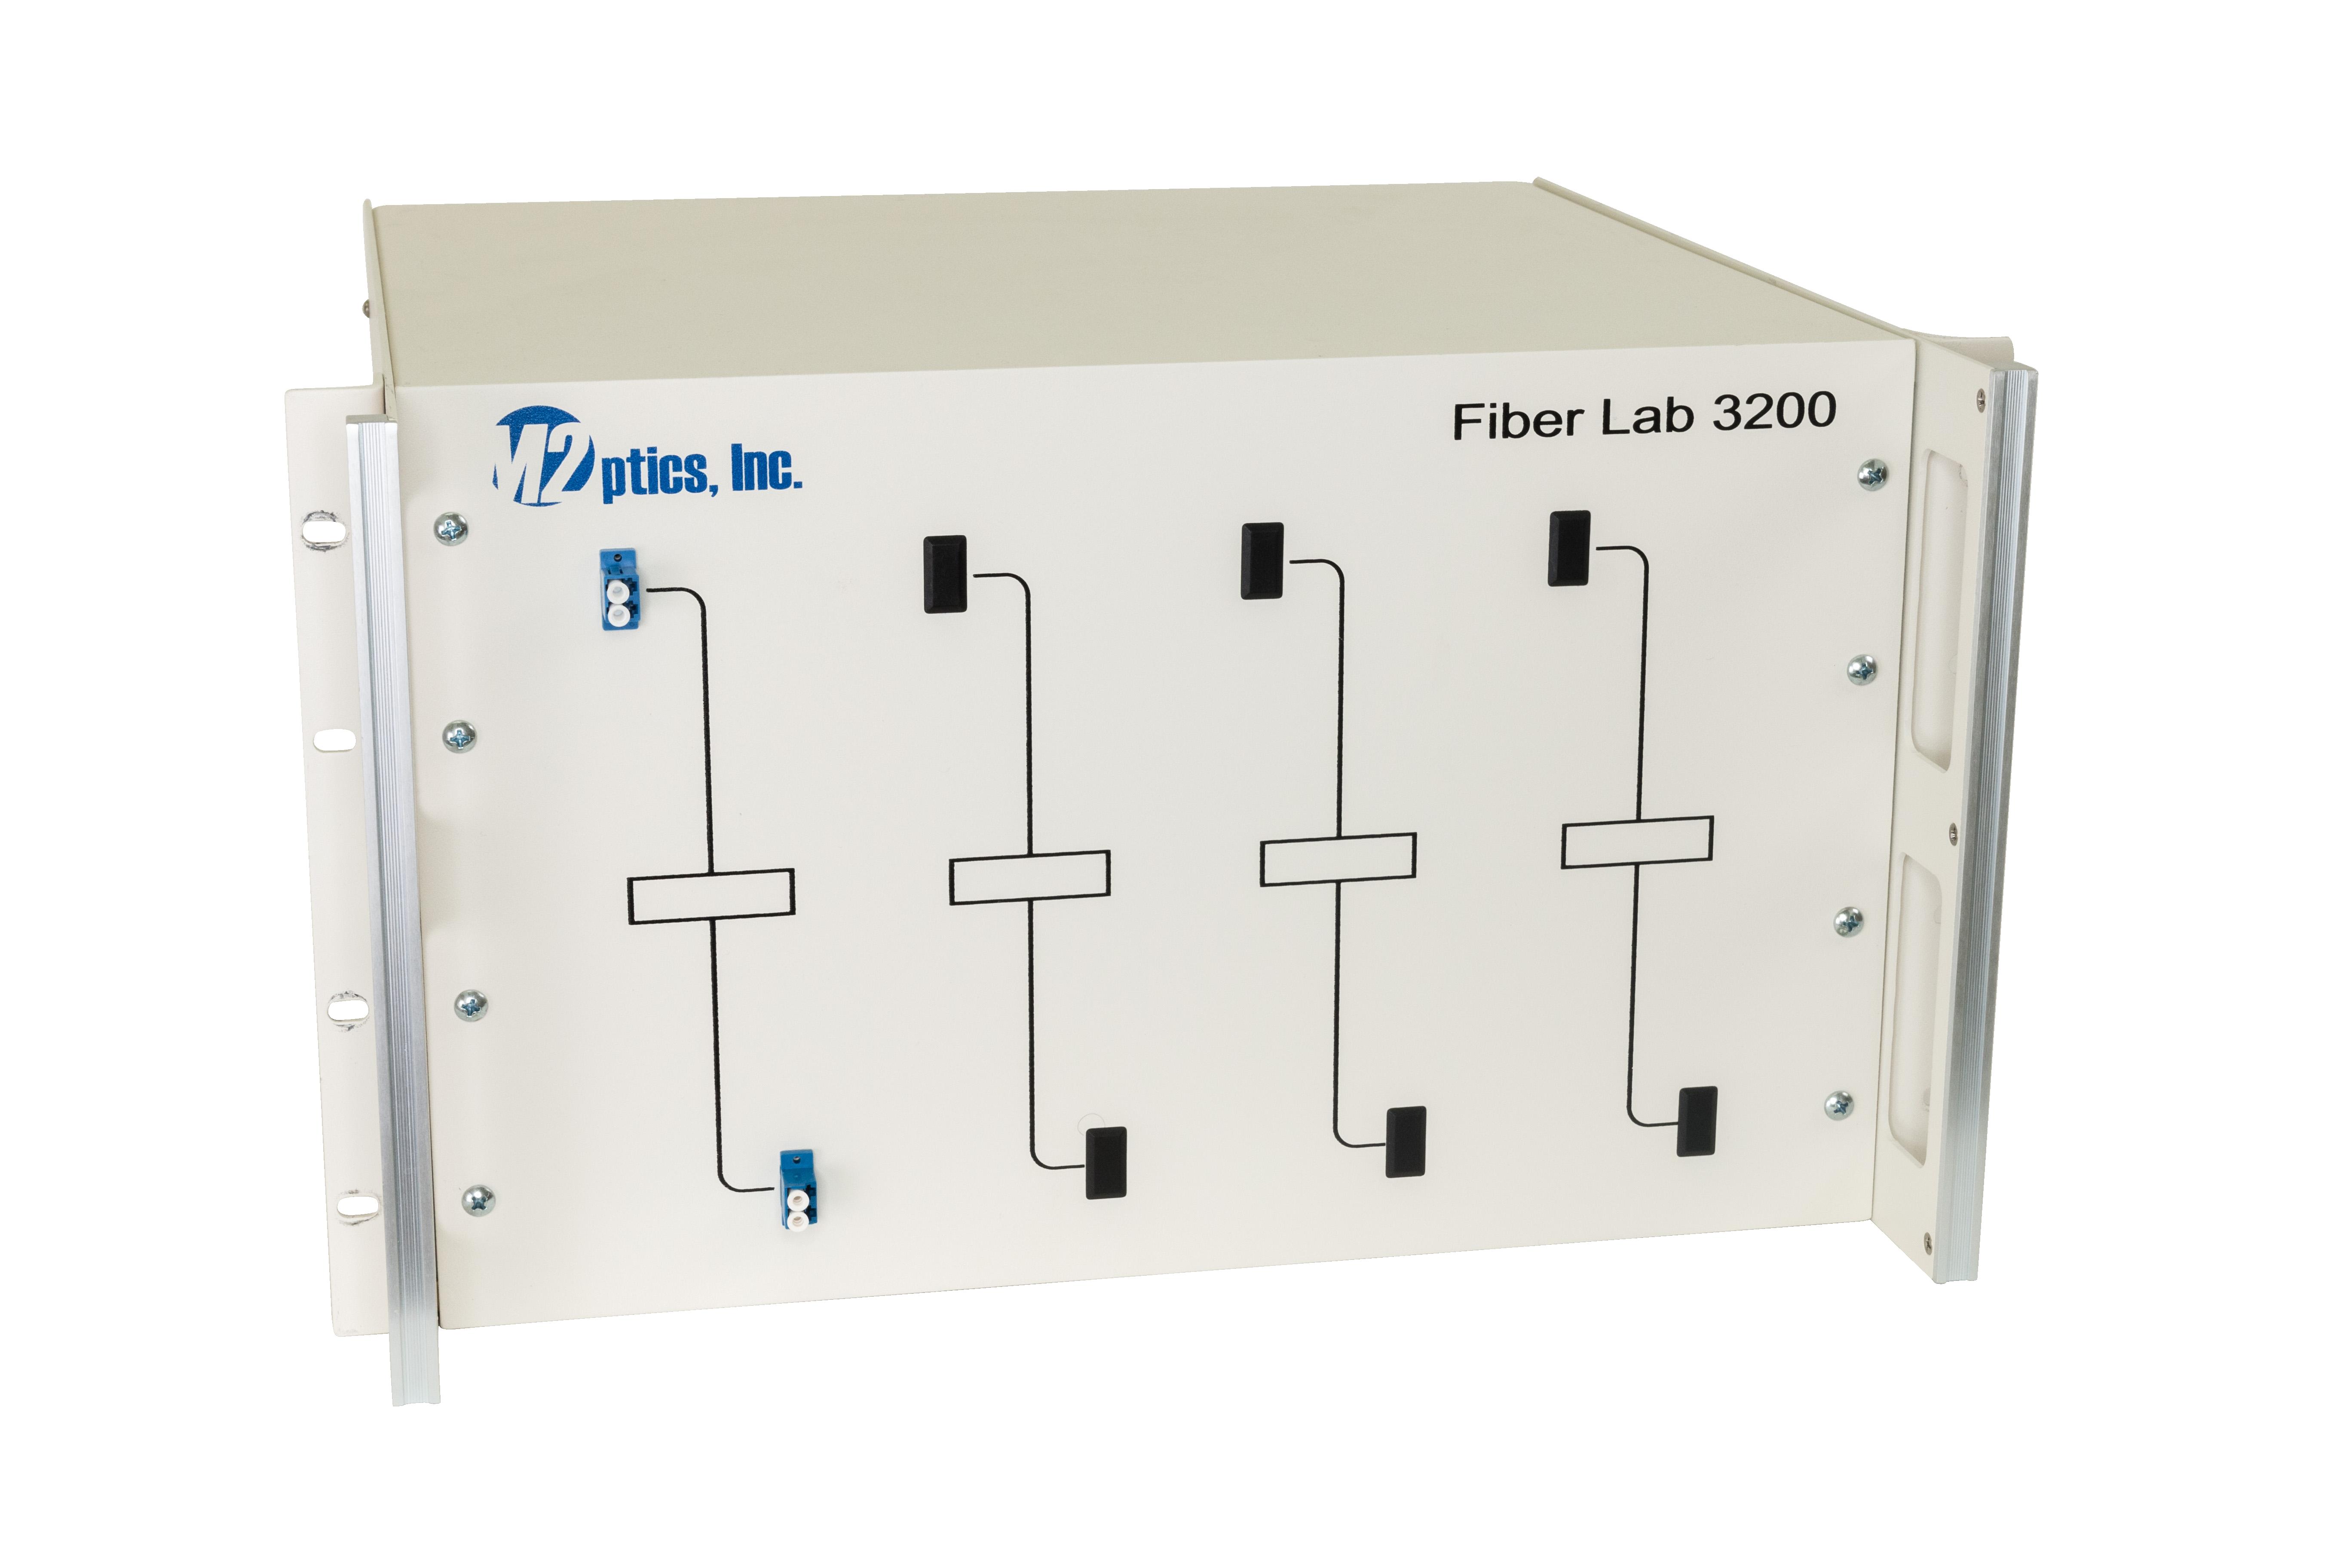 M2 Optics, Inc Fiber Lab 3200